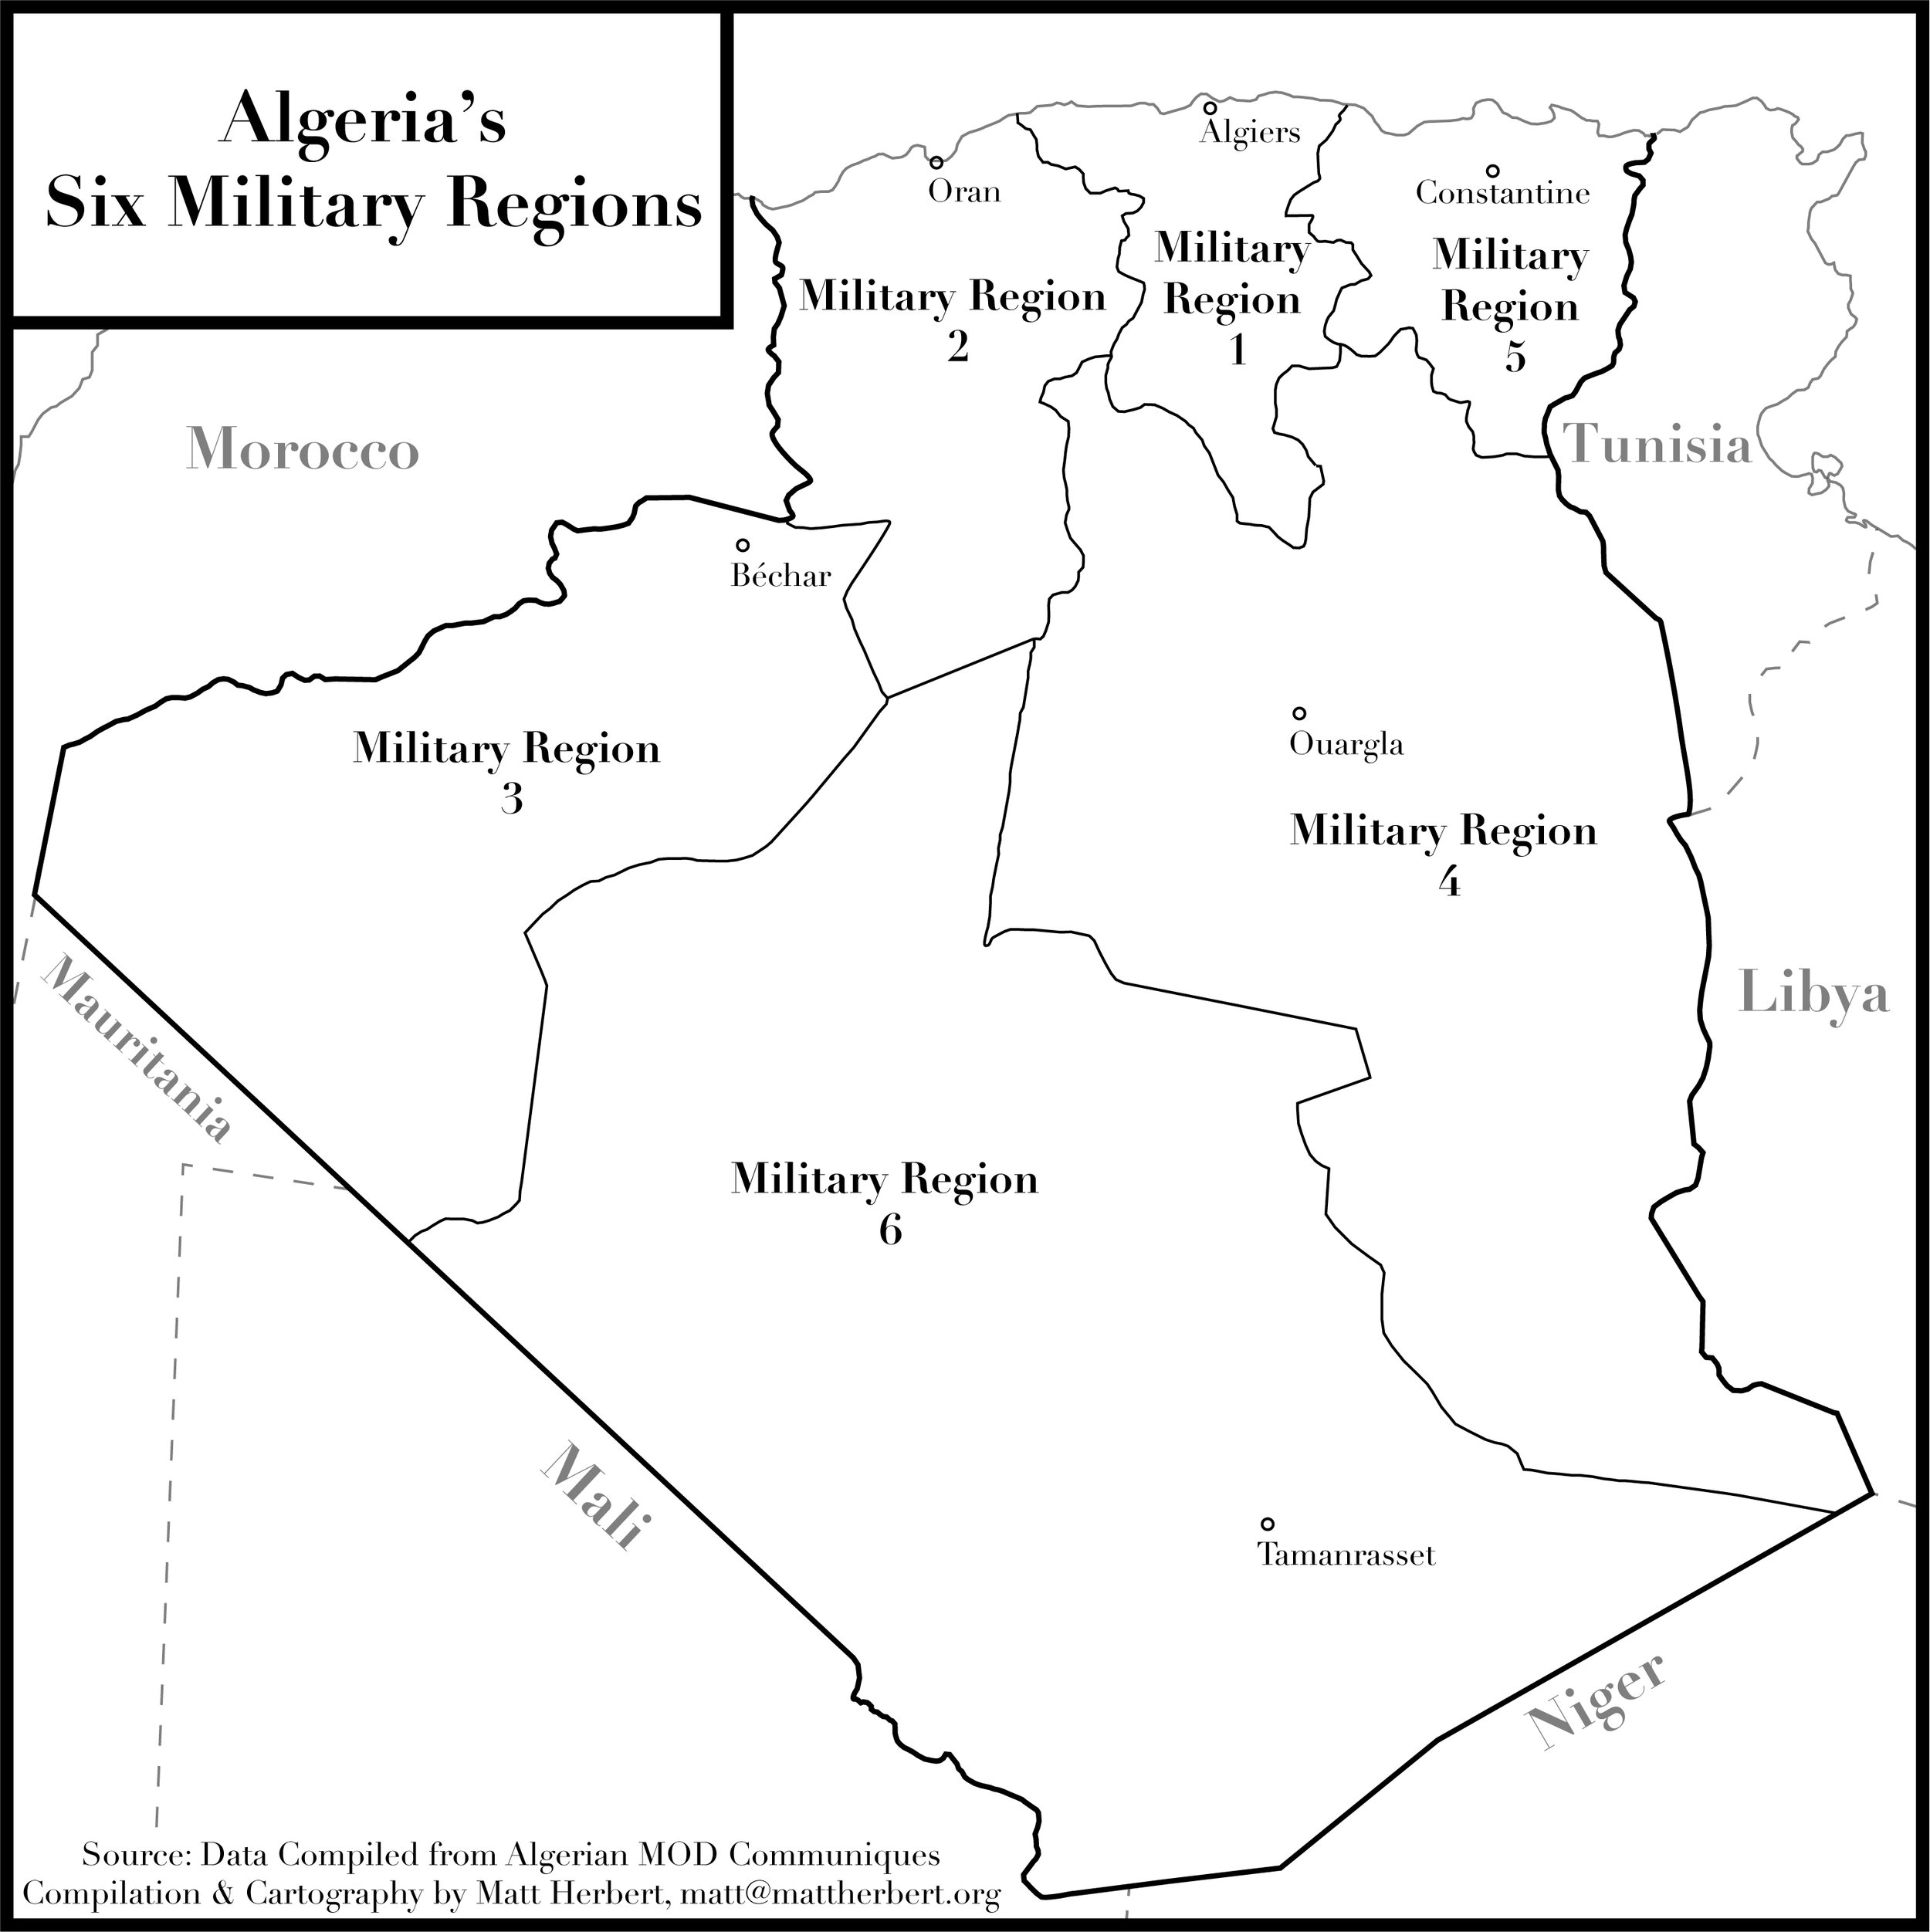 Algeria's Six Military Regions.jpg